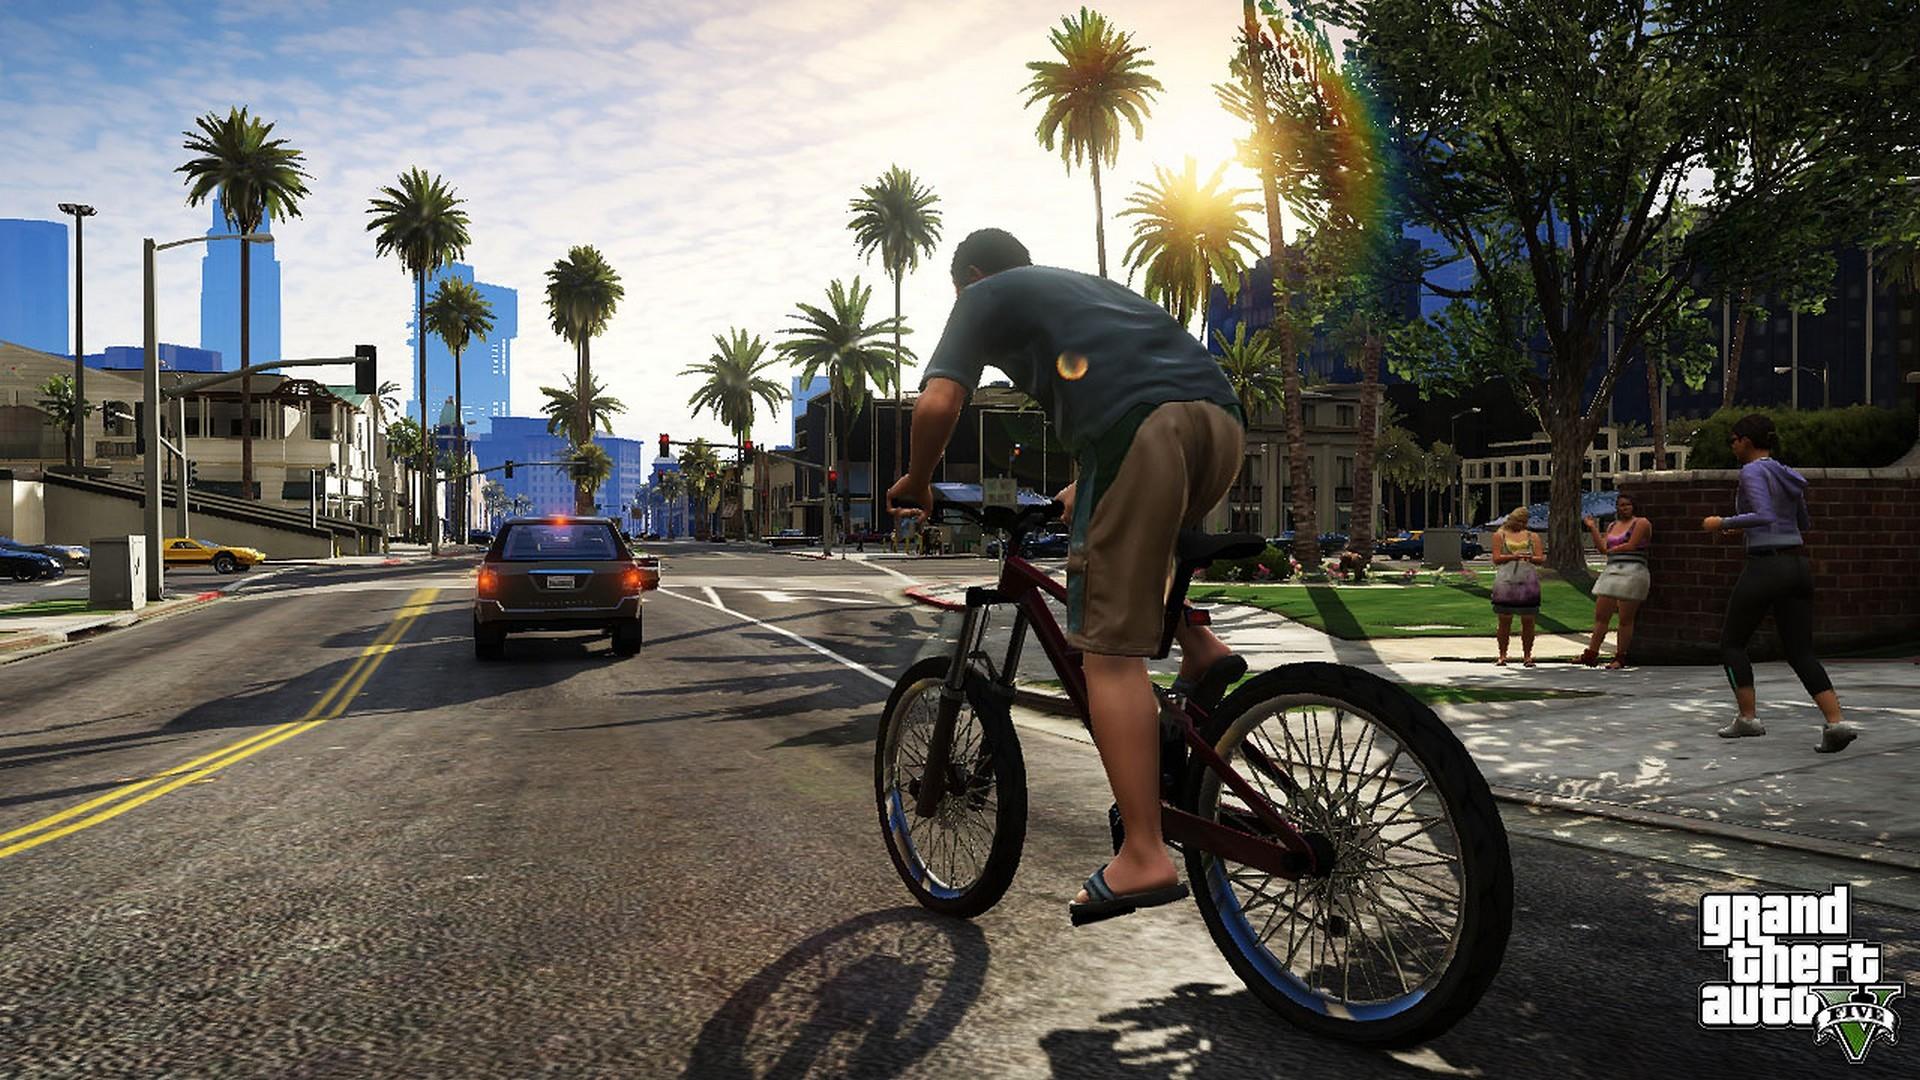 Grand Theft Auto V | ROCKSTAR | CD-KEY GLOBAL